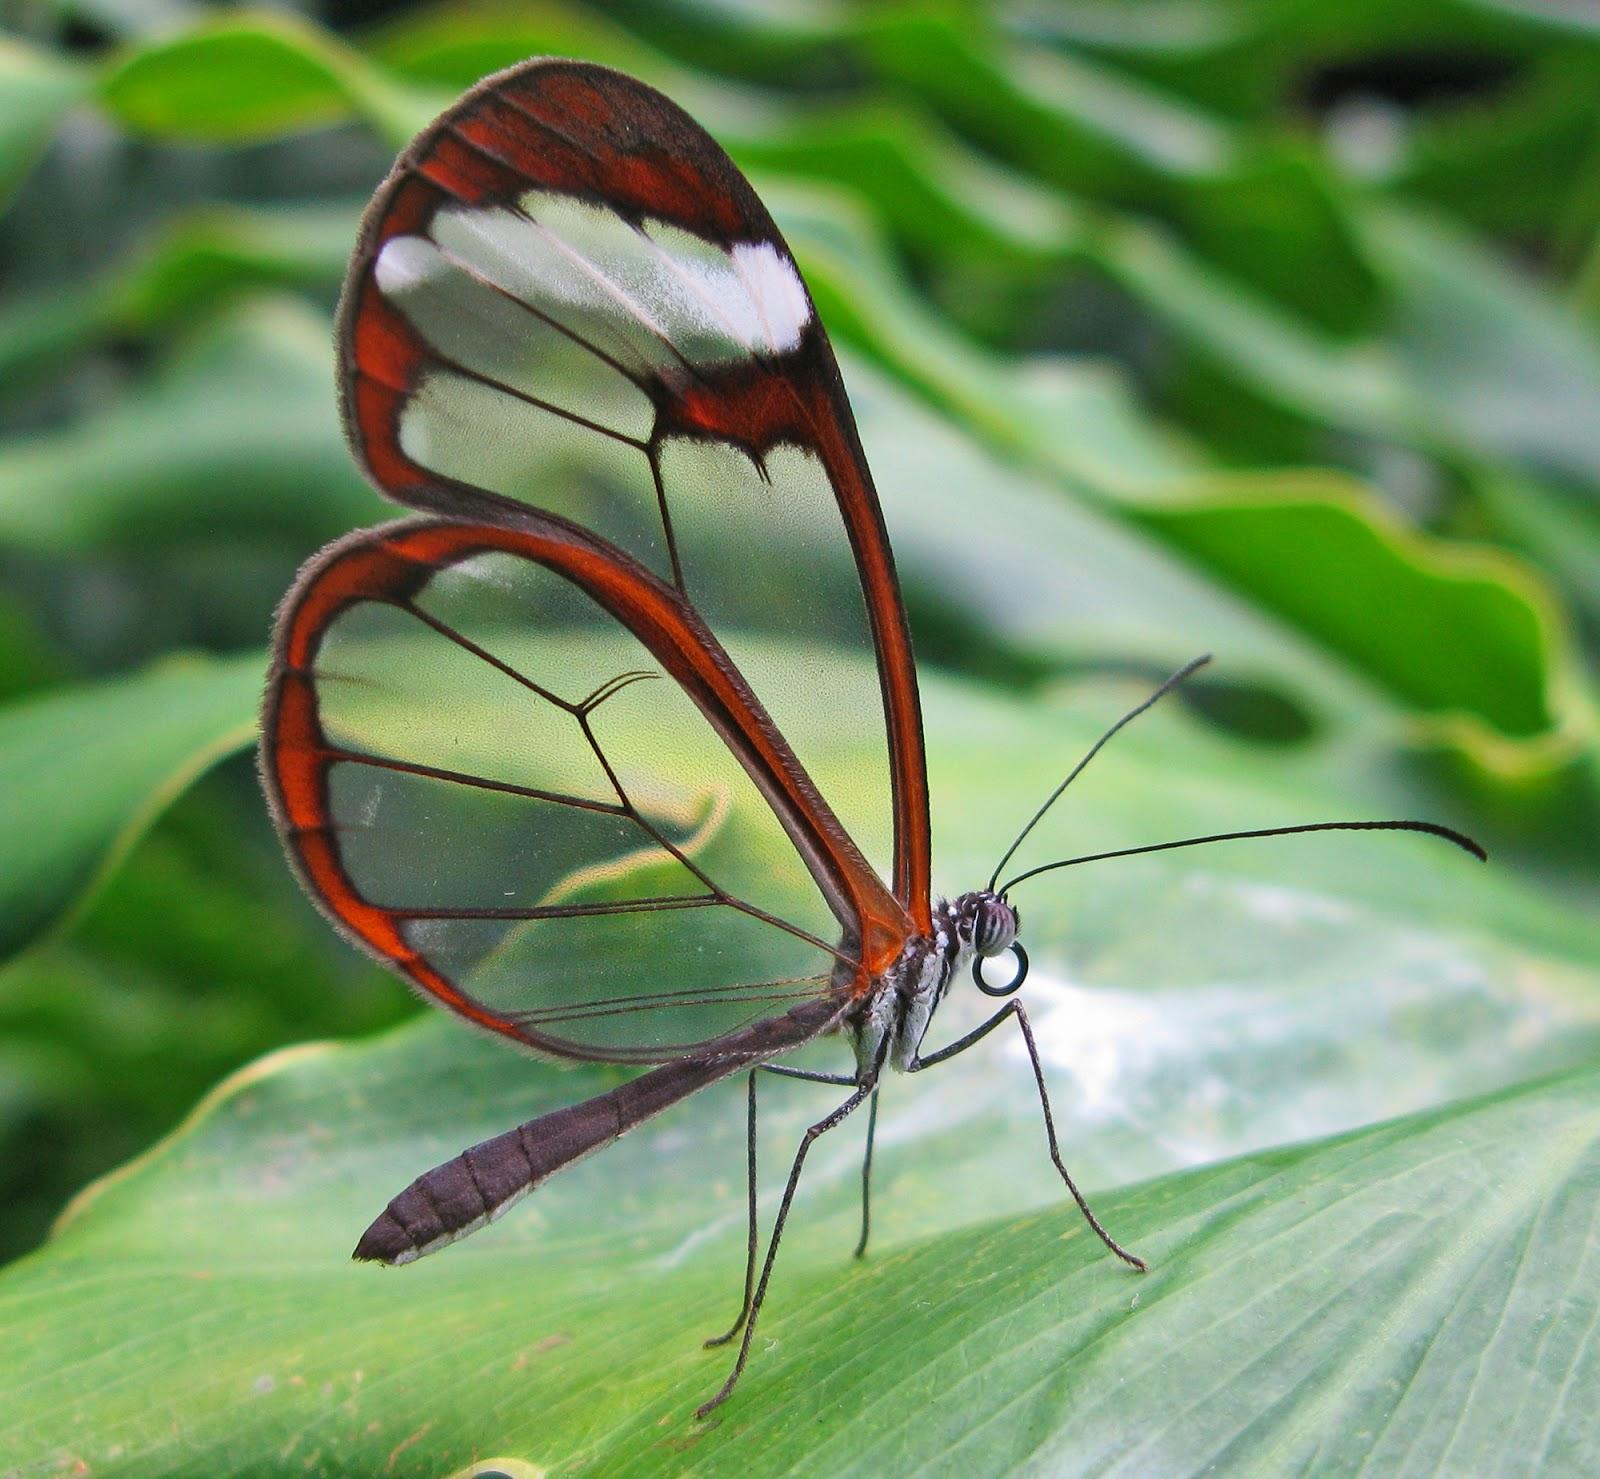 Blok888: Top 10 Most Beautiful Butterflies in the world 10 Most Beautiful Butterflies